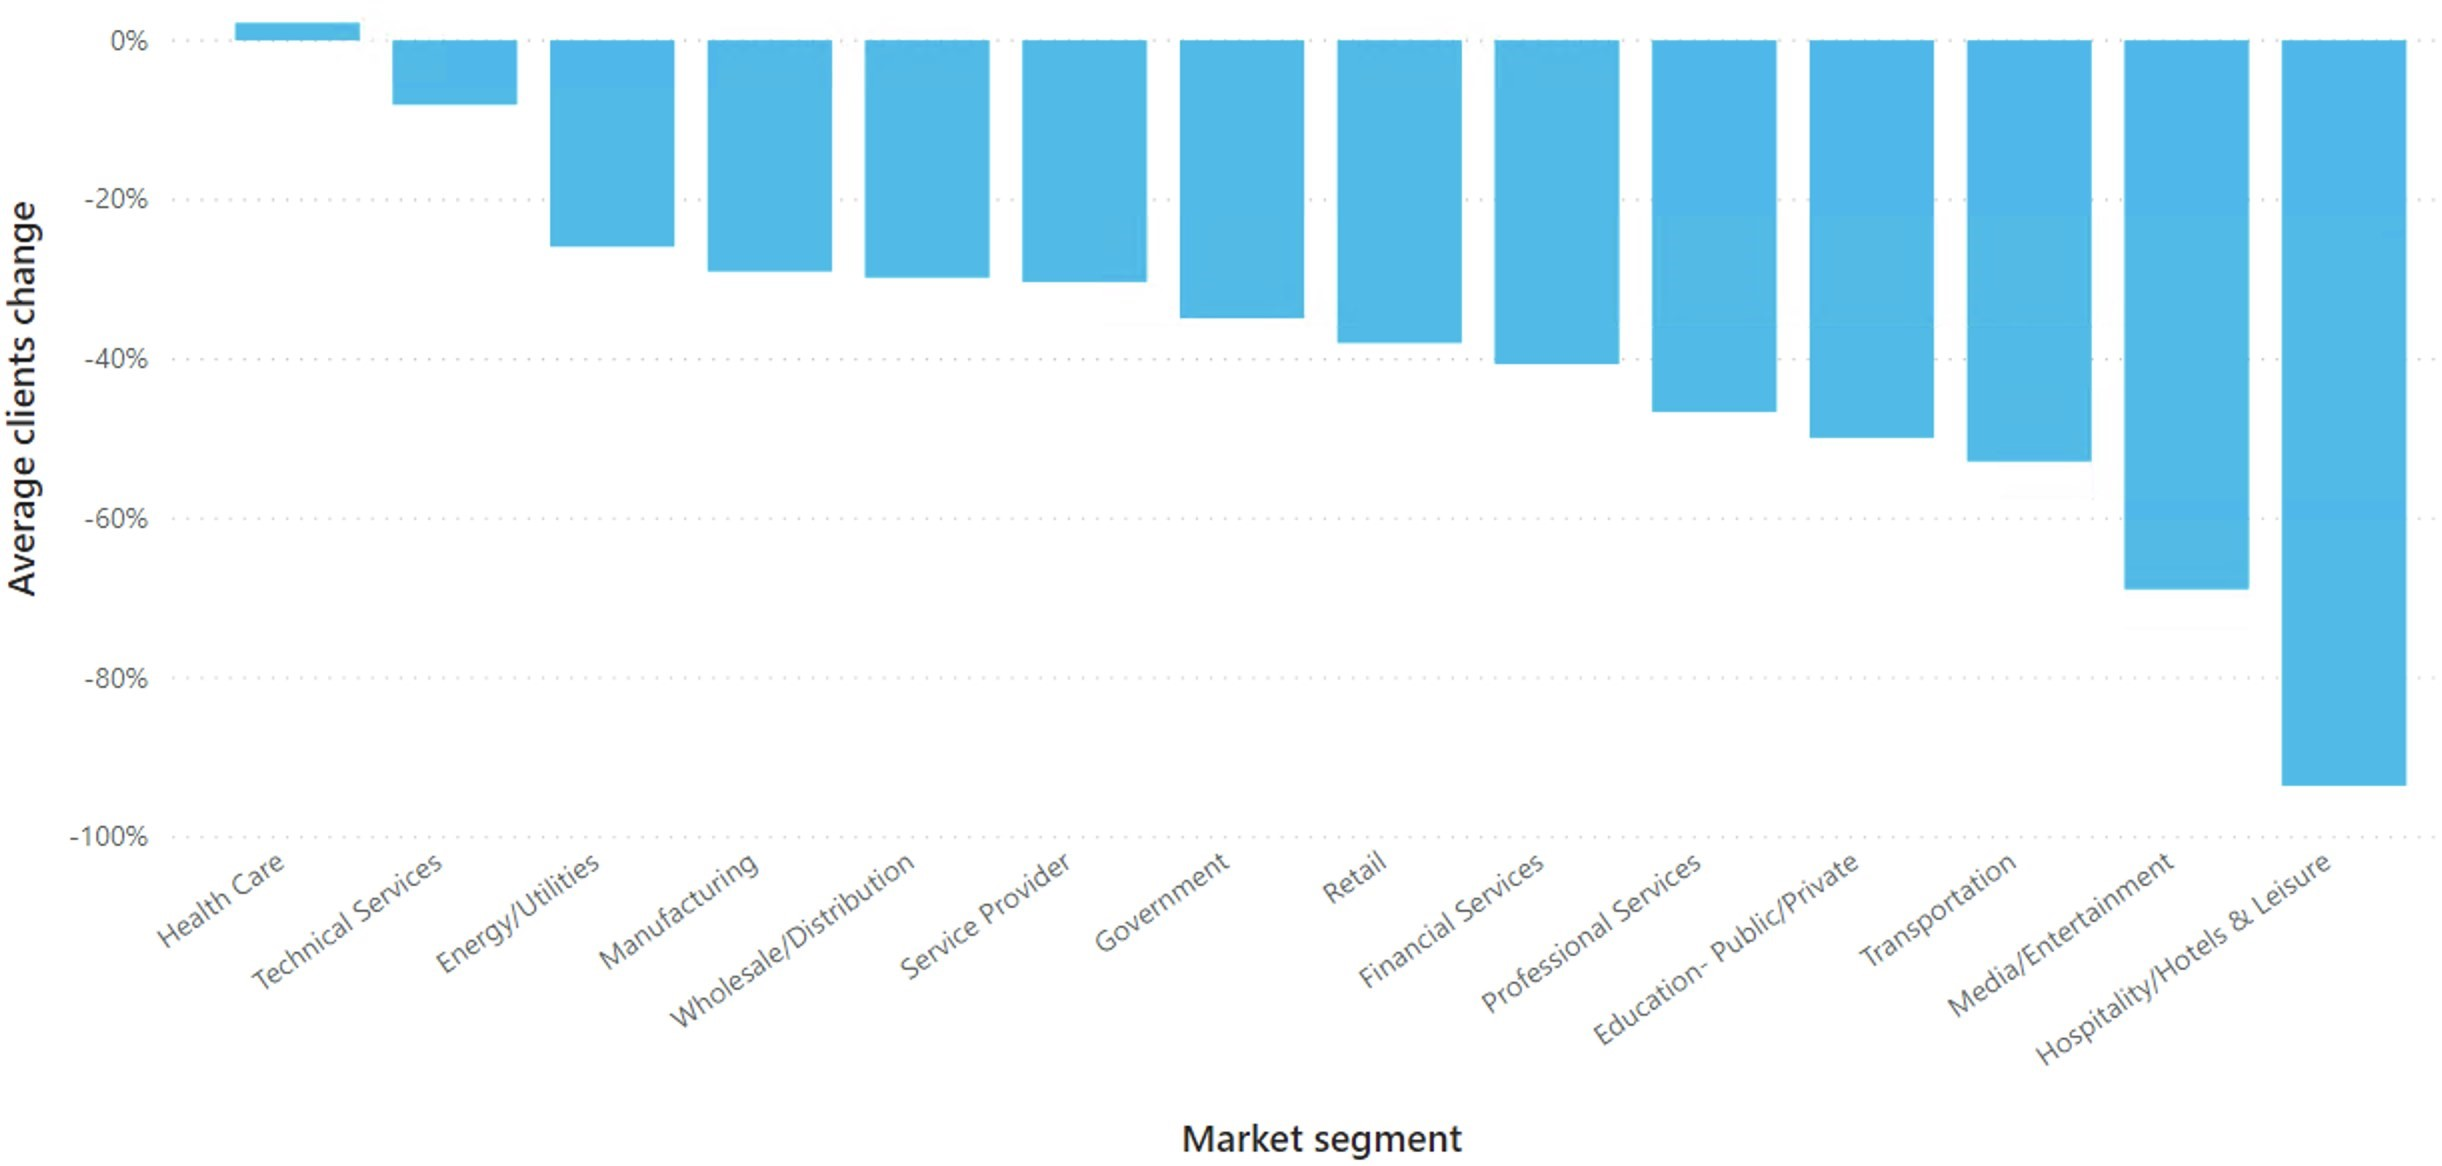 Average Clients change by Market segment